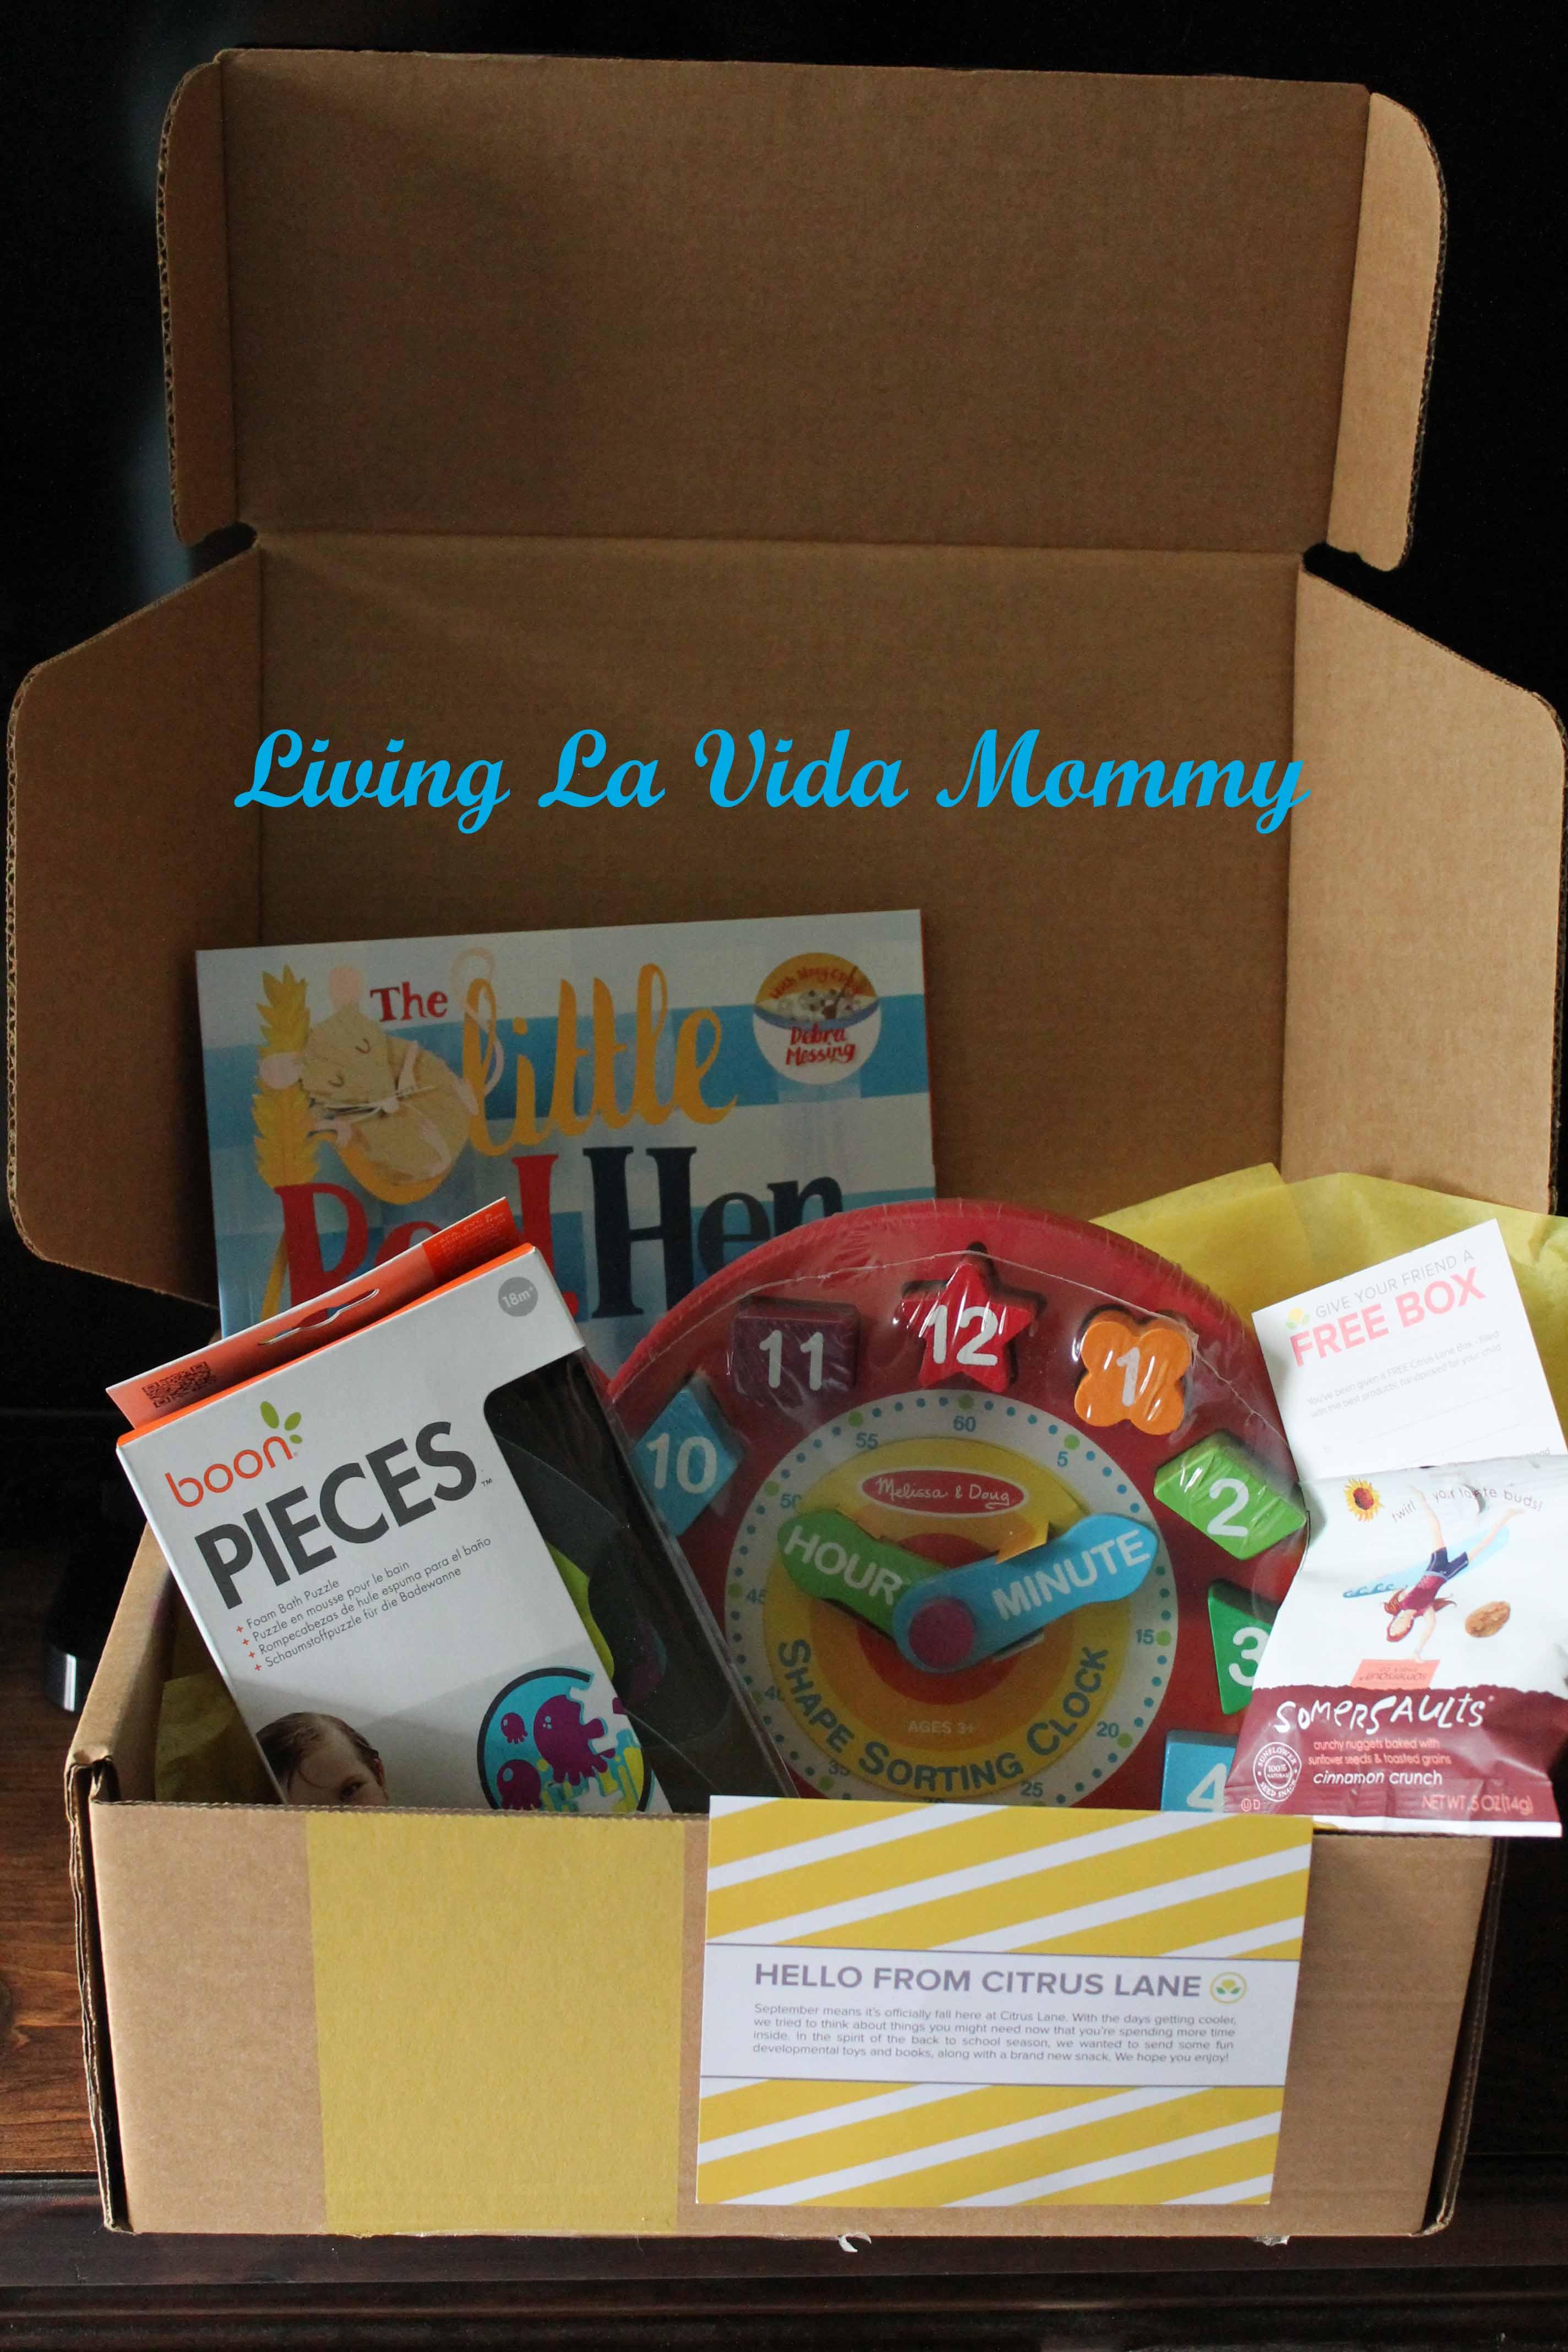 Boon | Living La Vida Mommy